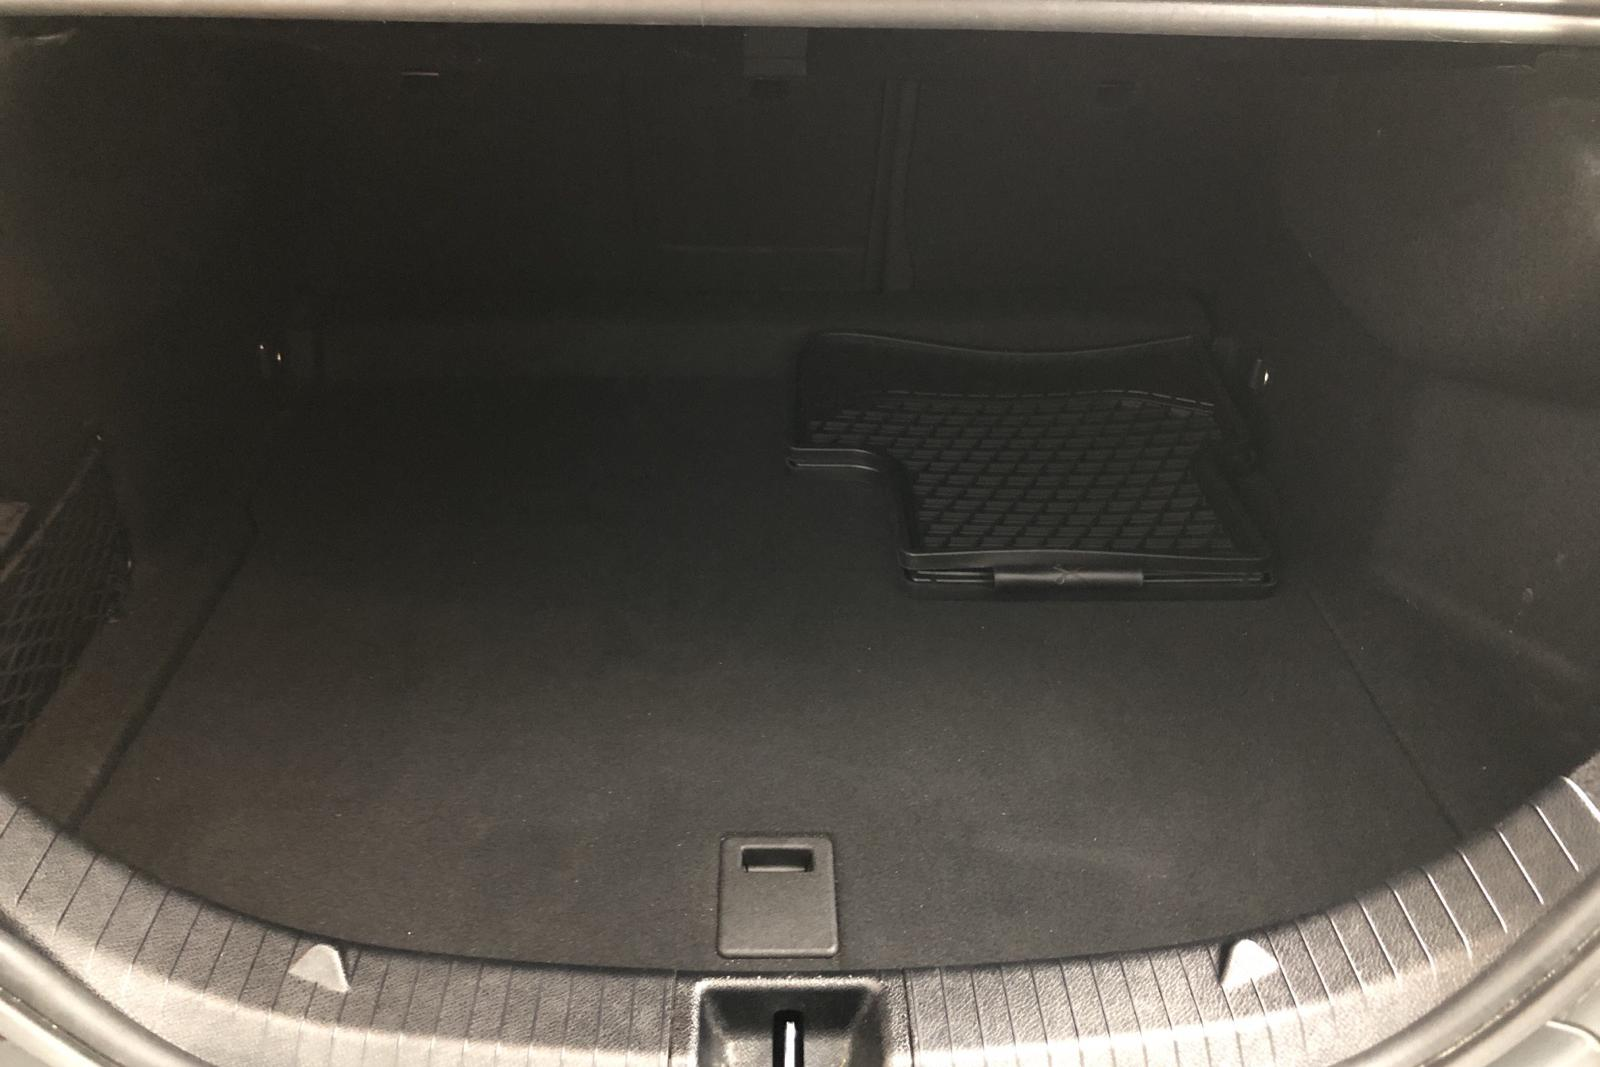 Mercedes CLA 180 Coupé C117 (122hk) AMG Panorama - 24 820 km - Automatic - black - 2019